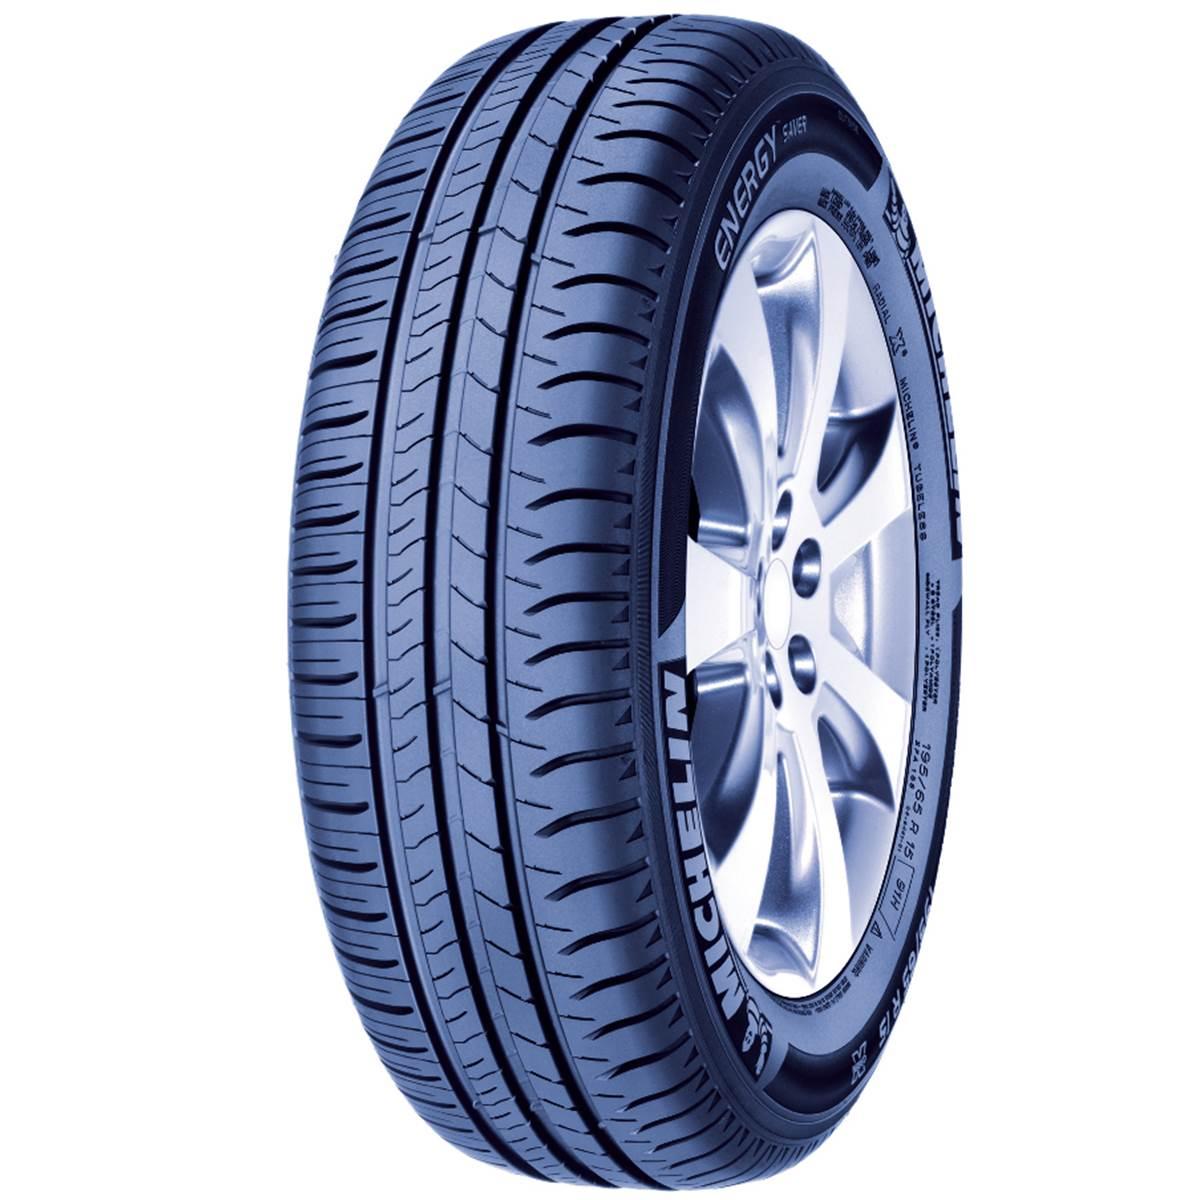 Pneu Michelin 175/65R14 82T Energy Saver